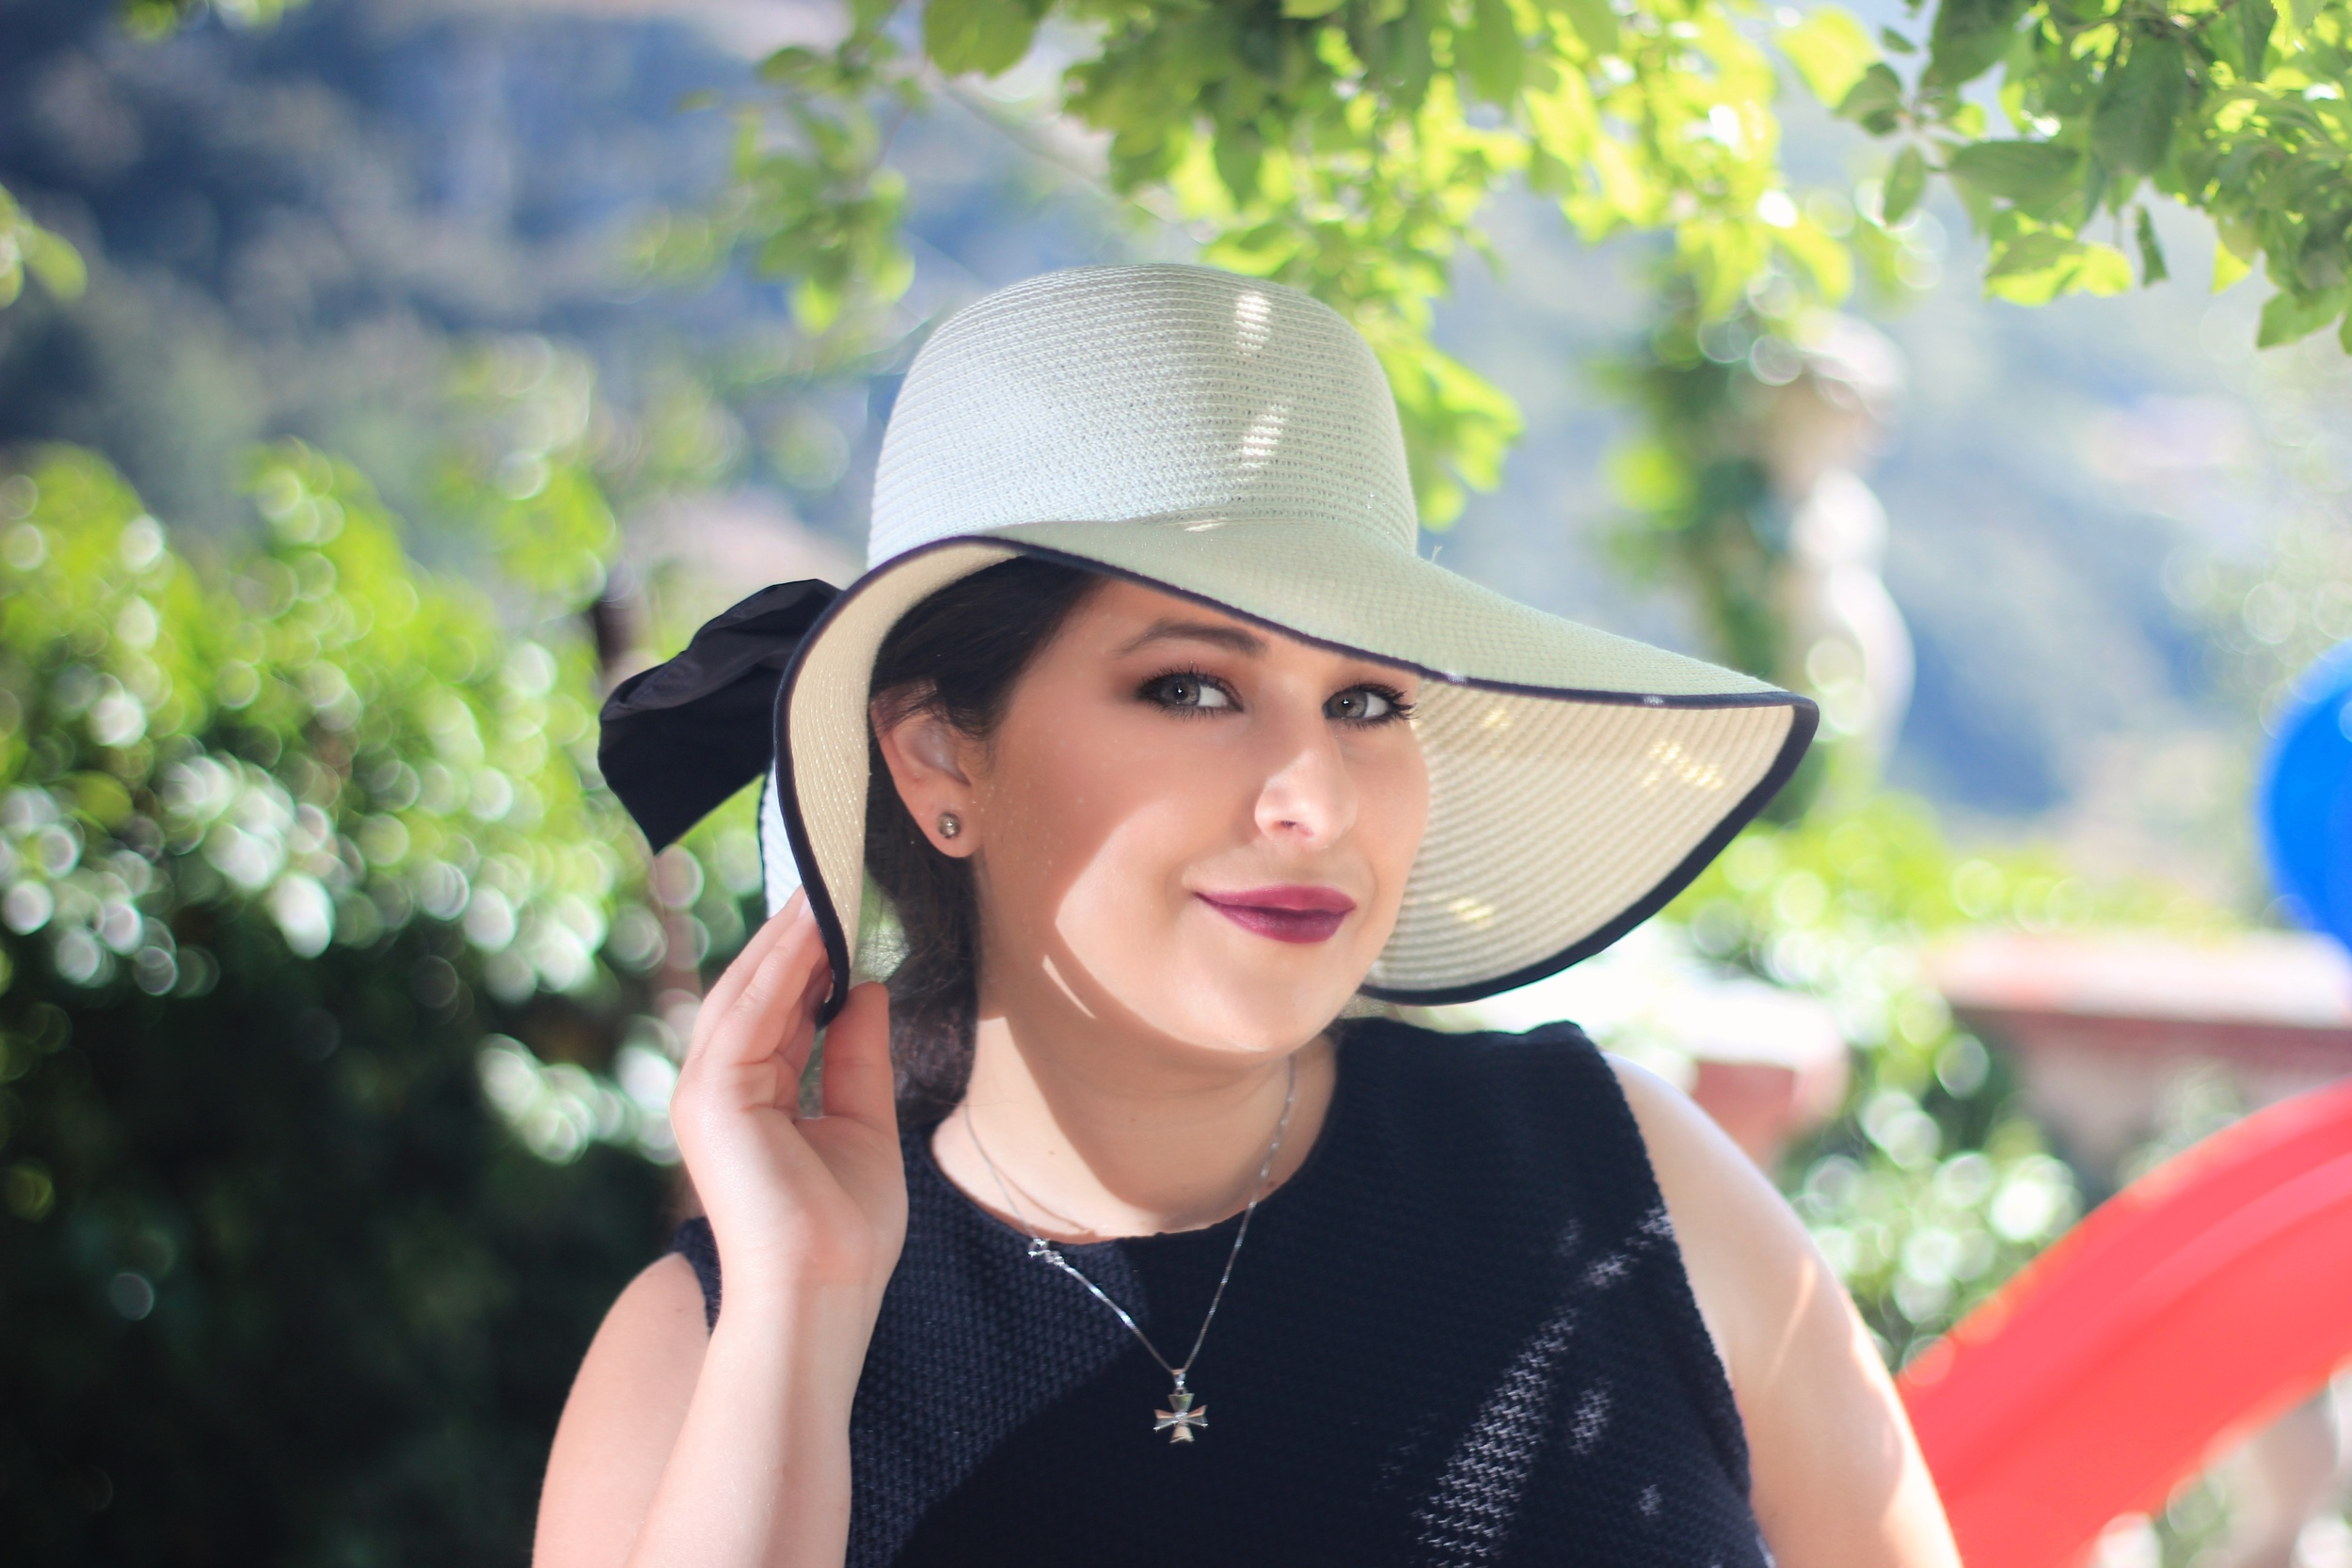 Alana Commercial Portrait wearing hat